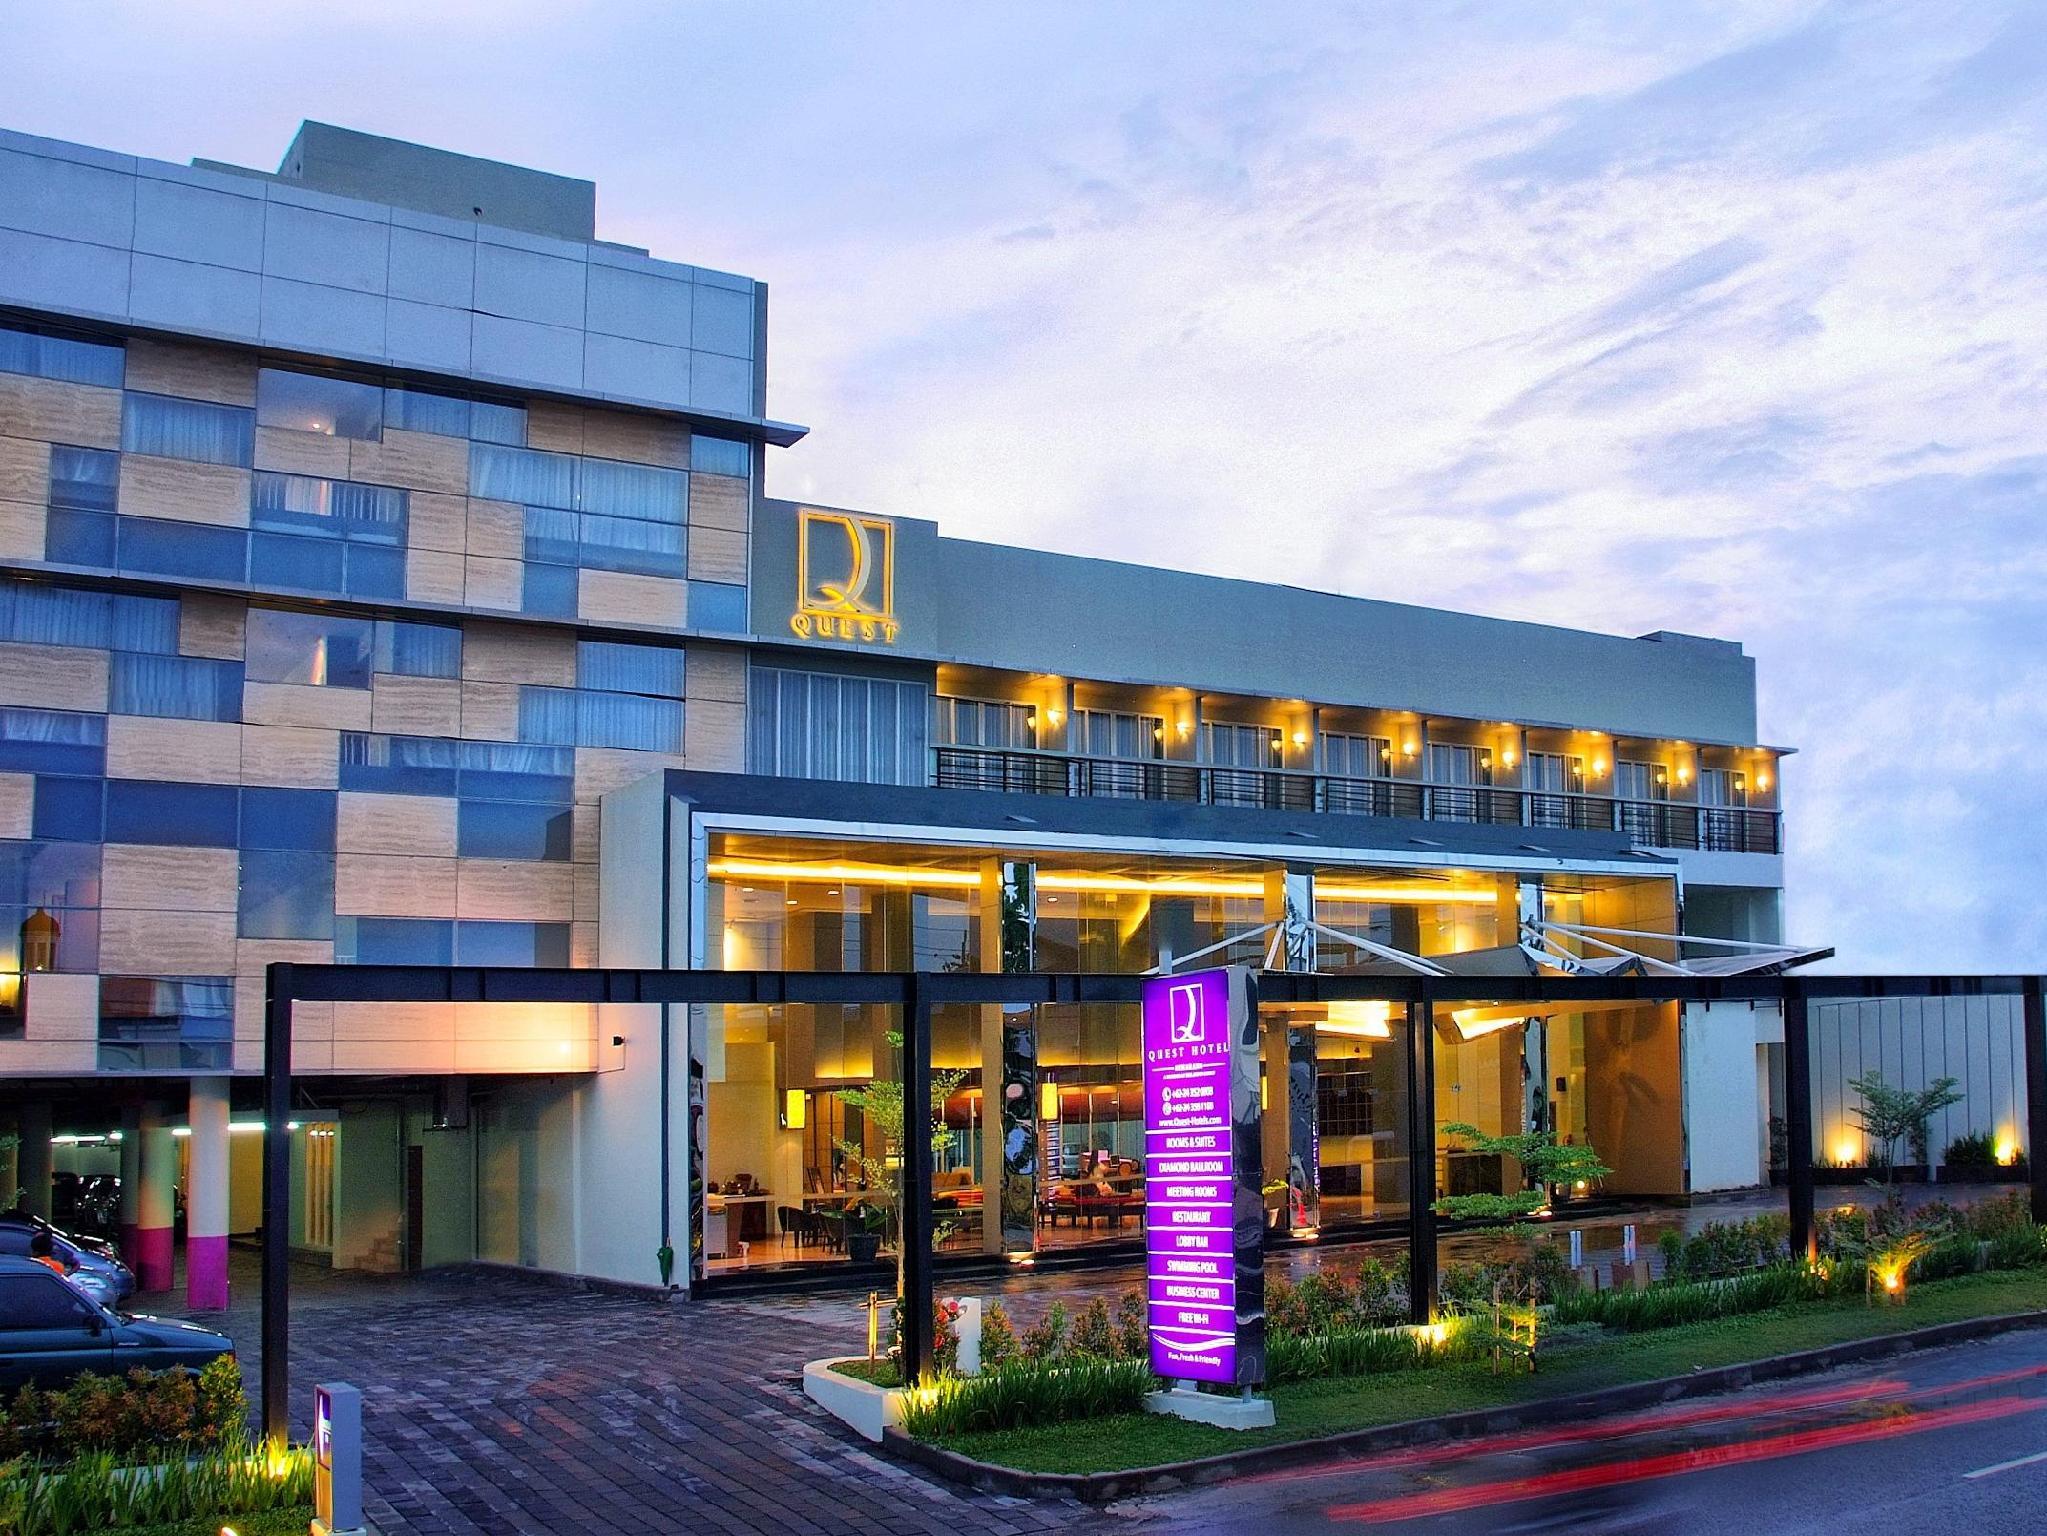 sumi hotel simpang lima semarang in indonesia asia